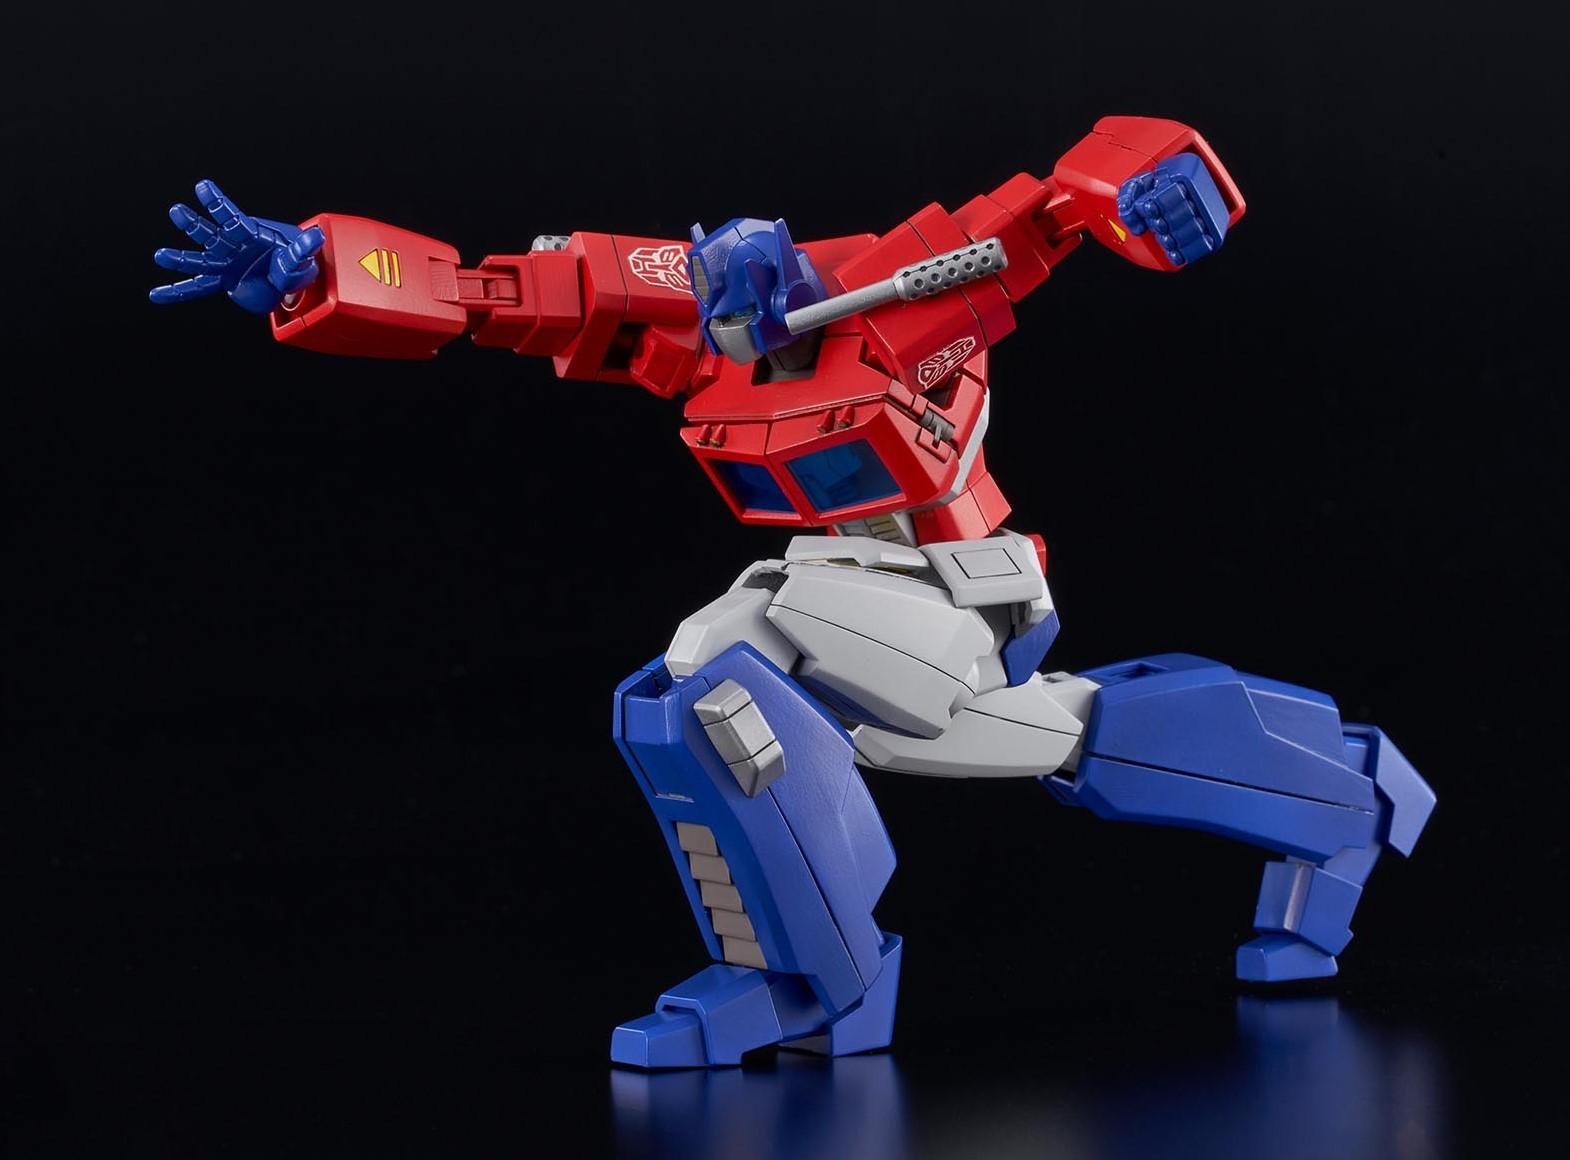 Transformers News: Flame Toys Furai Model Kit G1 Optimus Prime Revealed